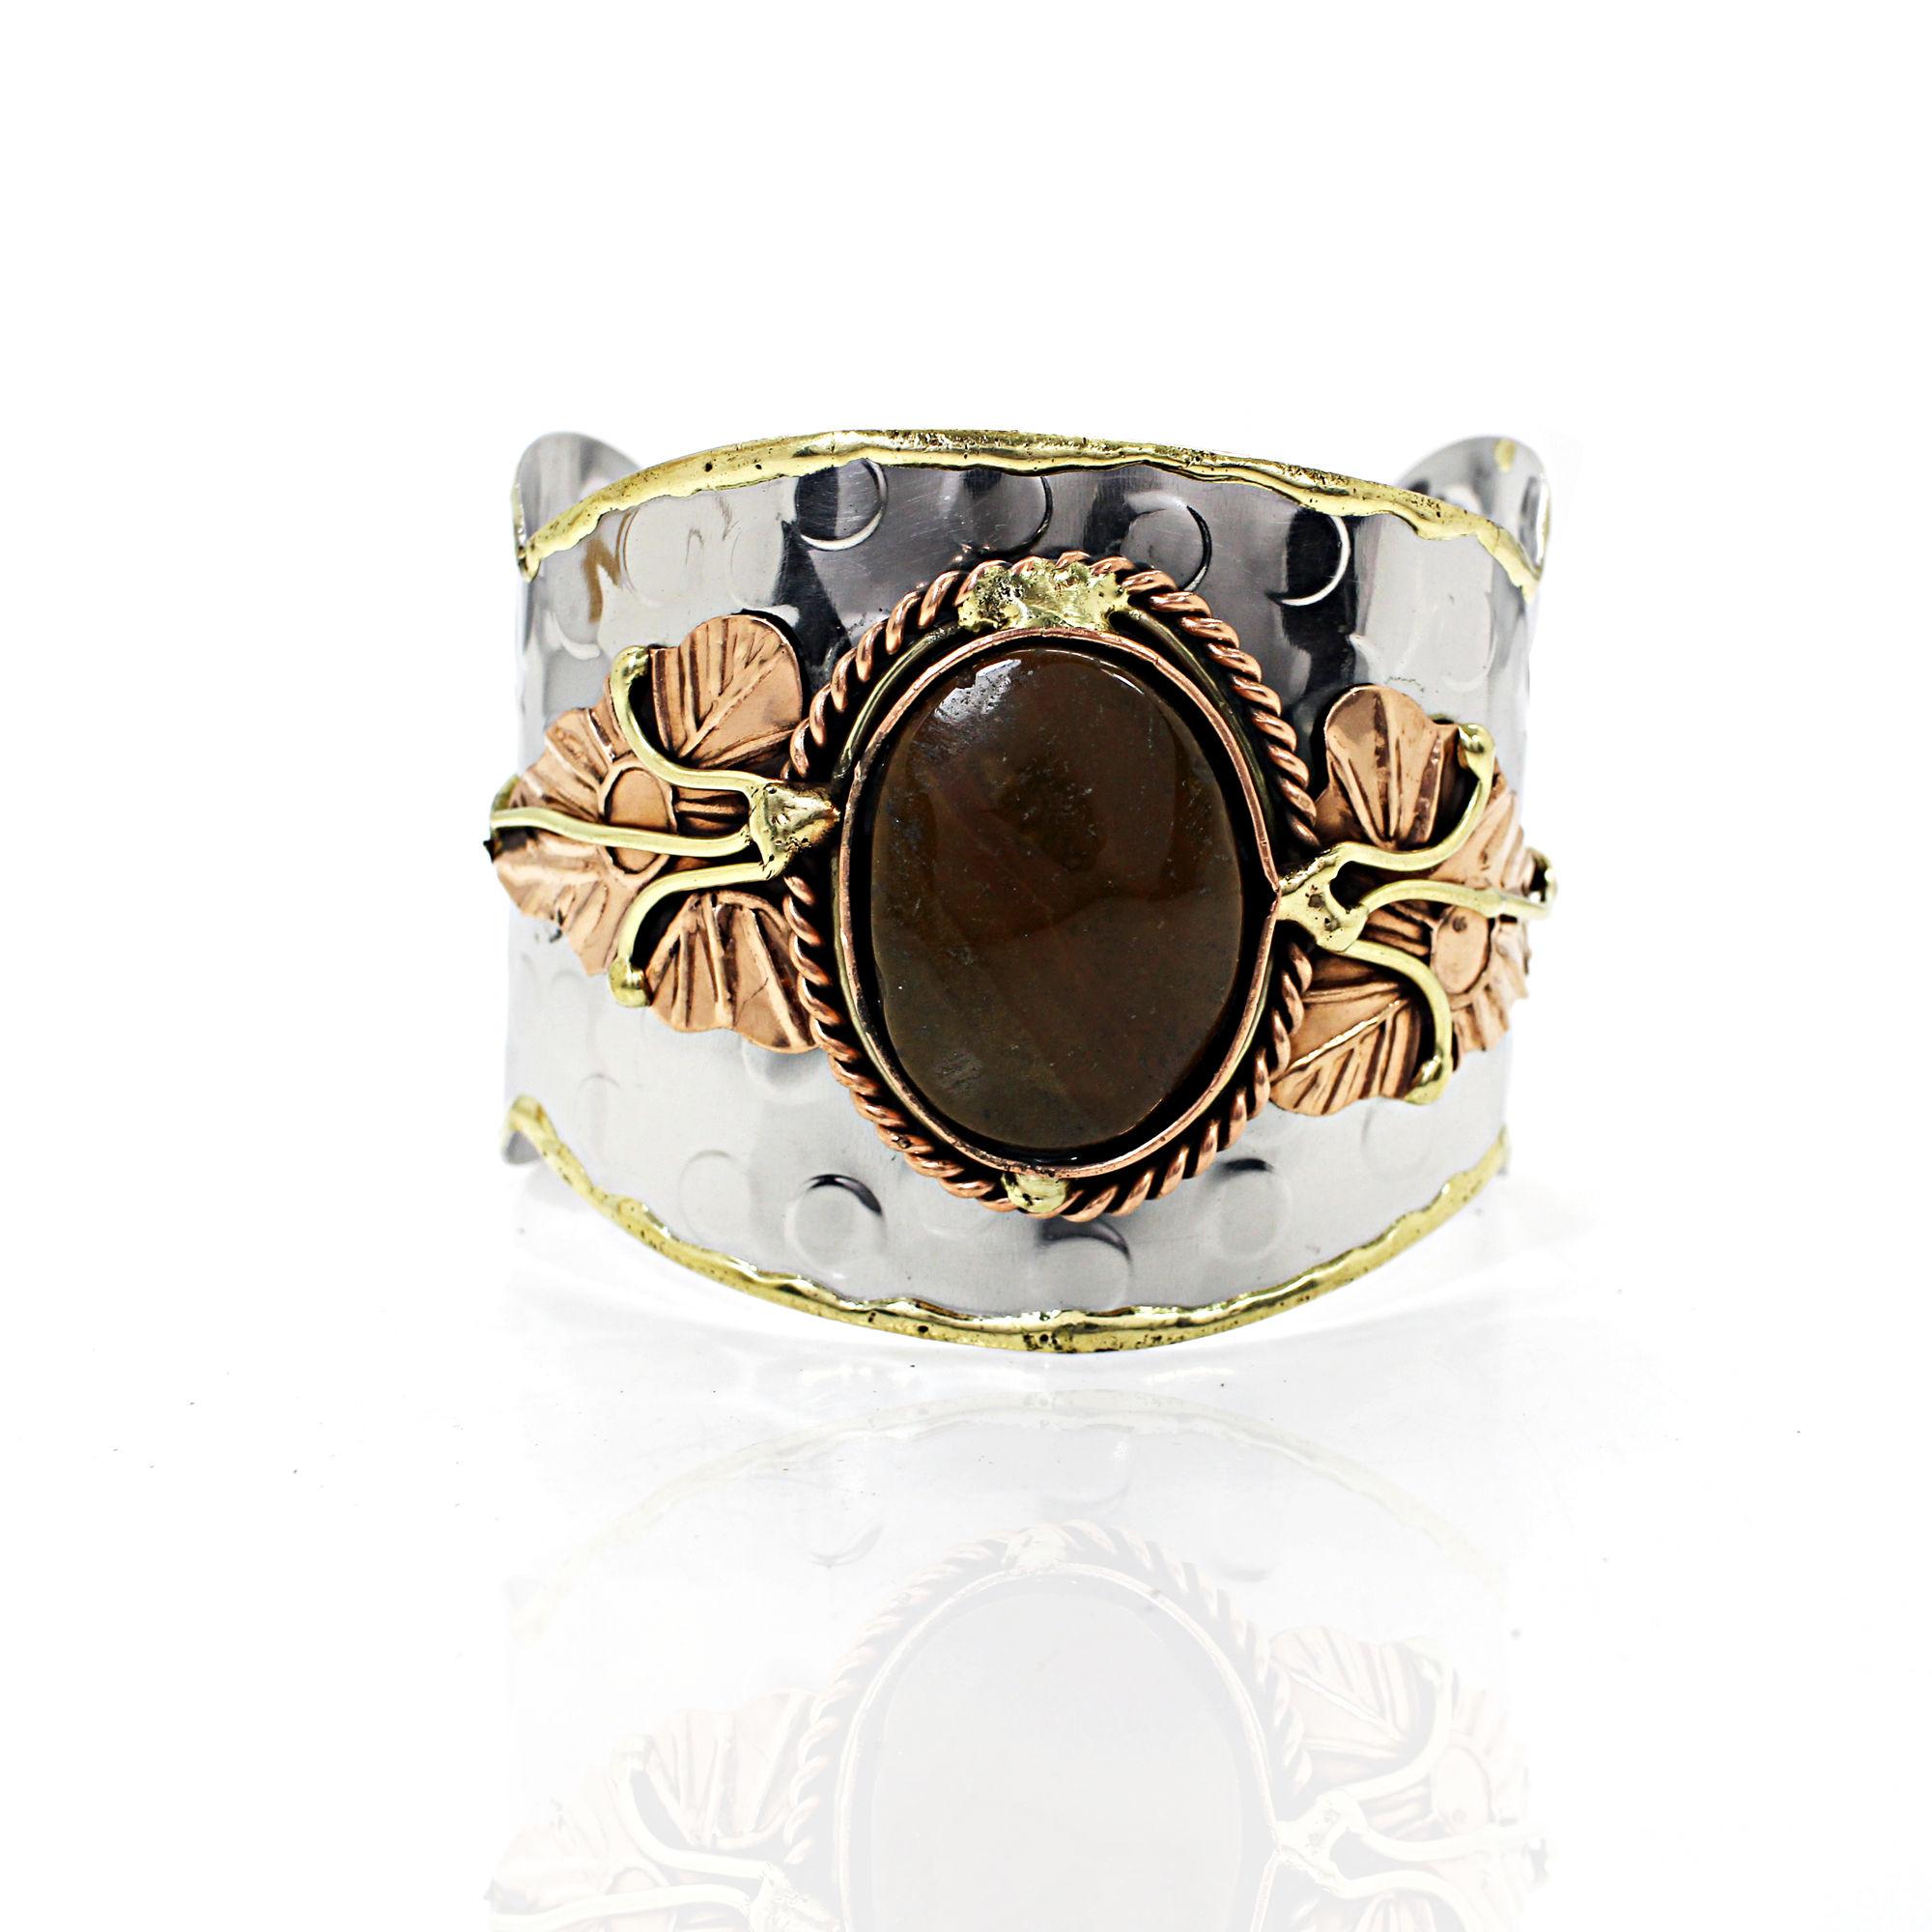 High Quality Natural Chrysocolla Gemstone Bracelet Brass Vermeil Adjustable Bracelet Bohemian Handmade Bracelet Gift For Her